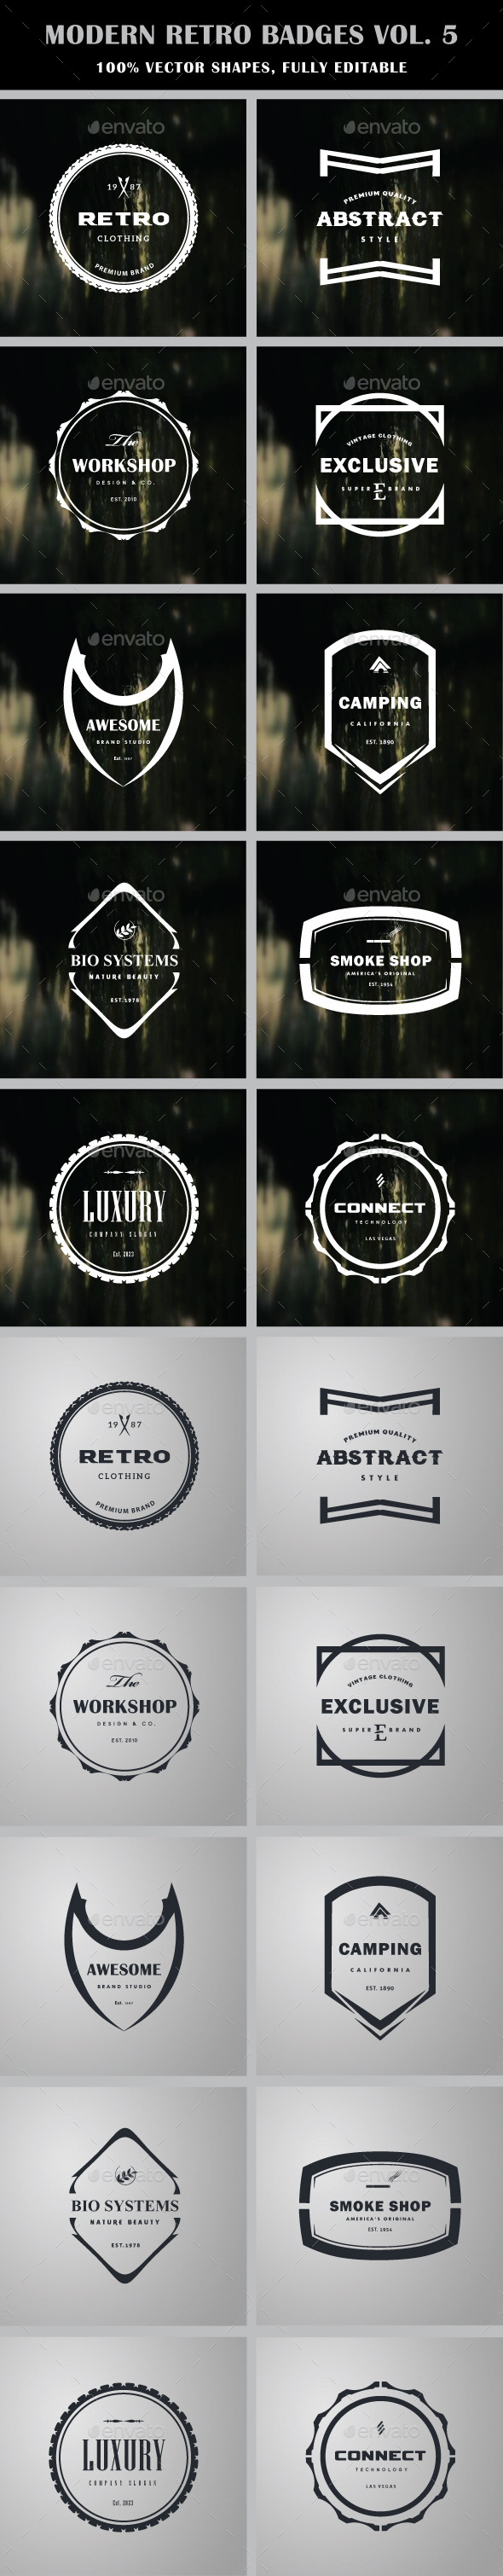 Modern Retro Badges Vol. 5 - Badges & Stickers Web Elements